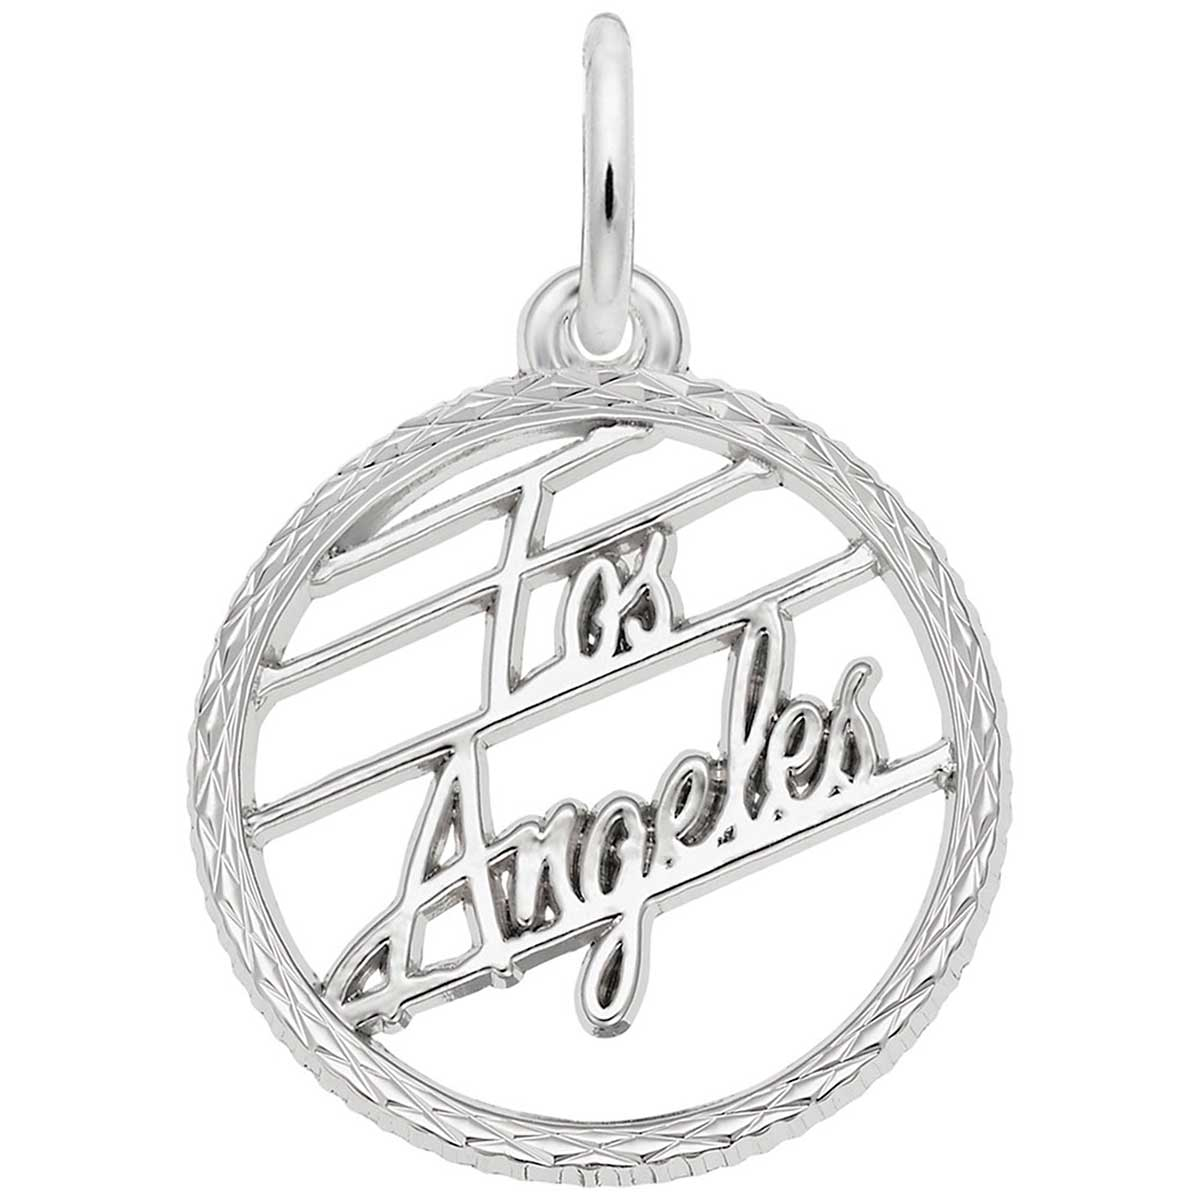 Pandora Jewelry Los Angeles: Rembrandt Los Angeles Charm, Sterling Silver: Precious